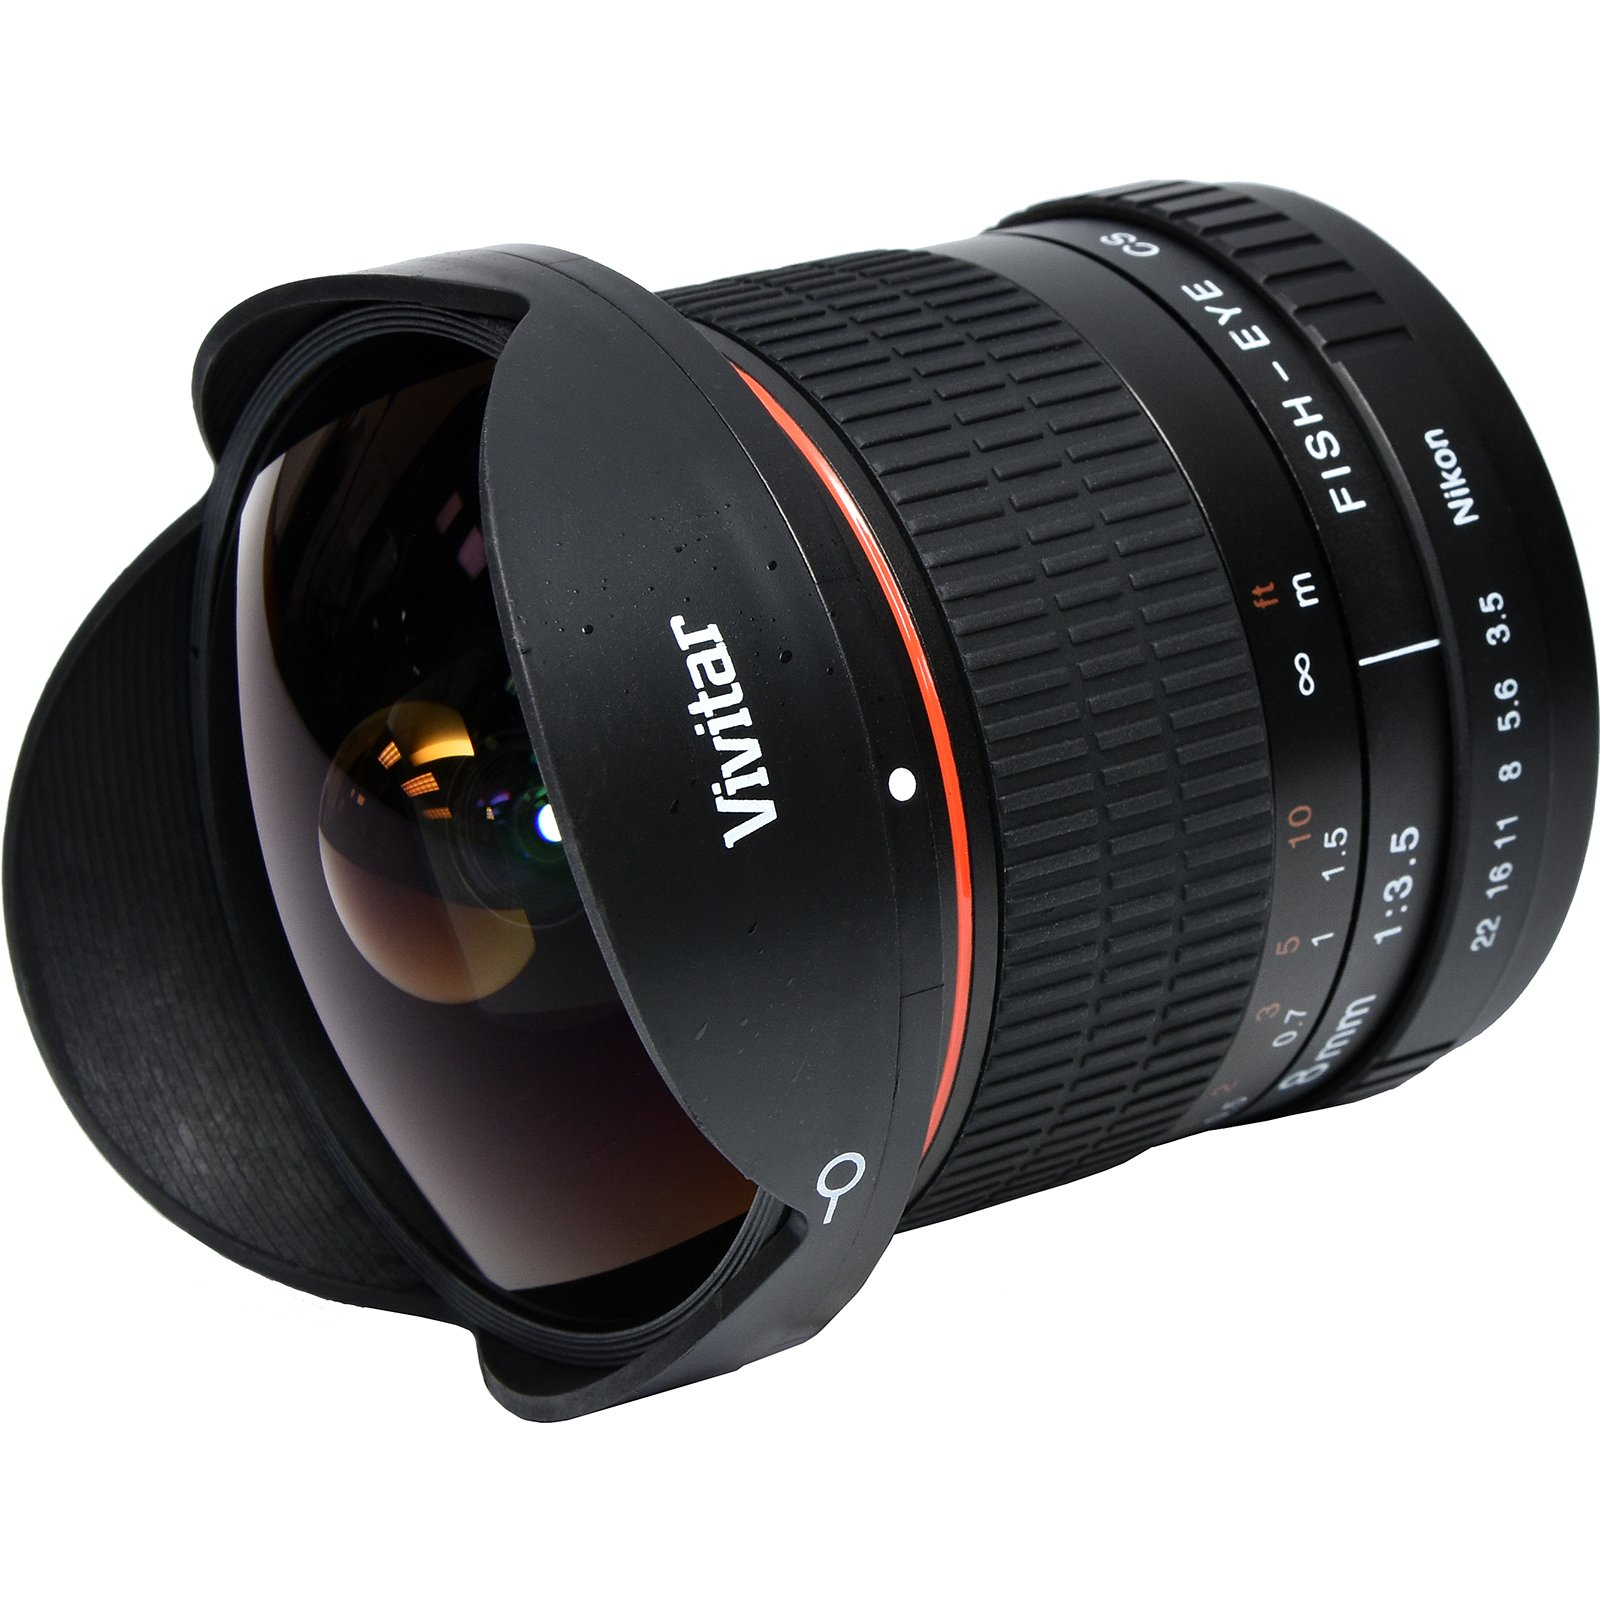 Vivitar 8mm f/3.5 Fisheye Lens with Flash + Soft Box + Cleaning Kit for Nikon Digital SLR Cameras by Vivitar (Image #2)